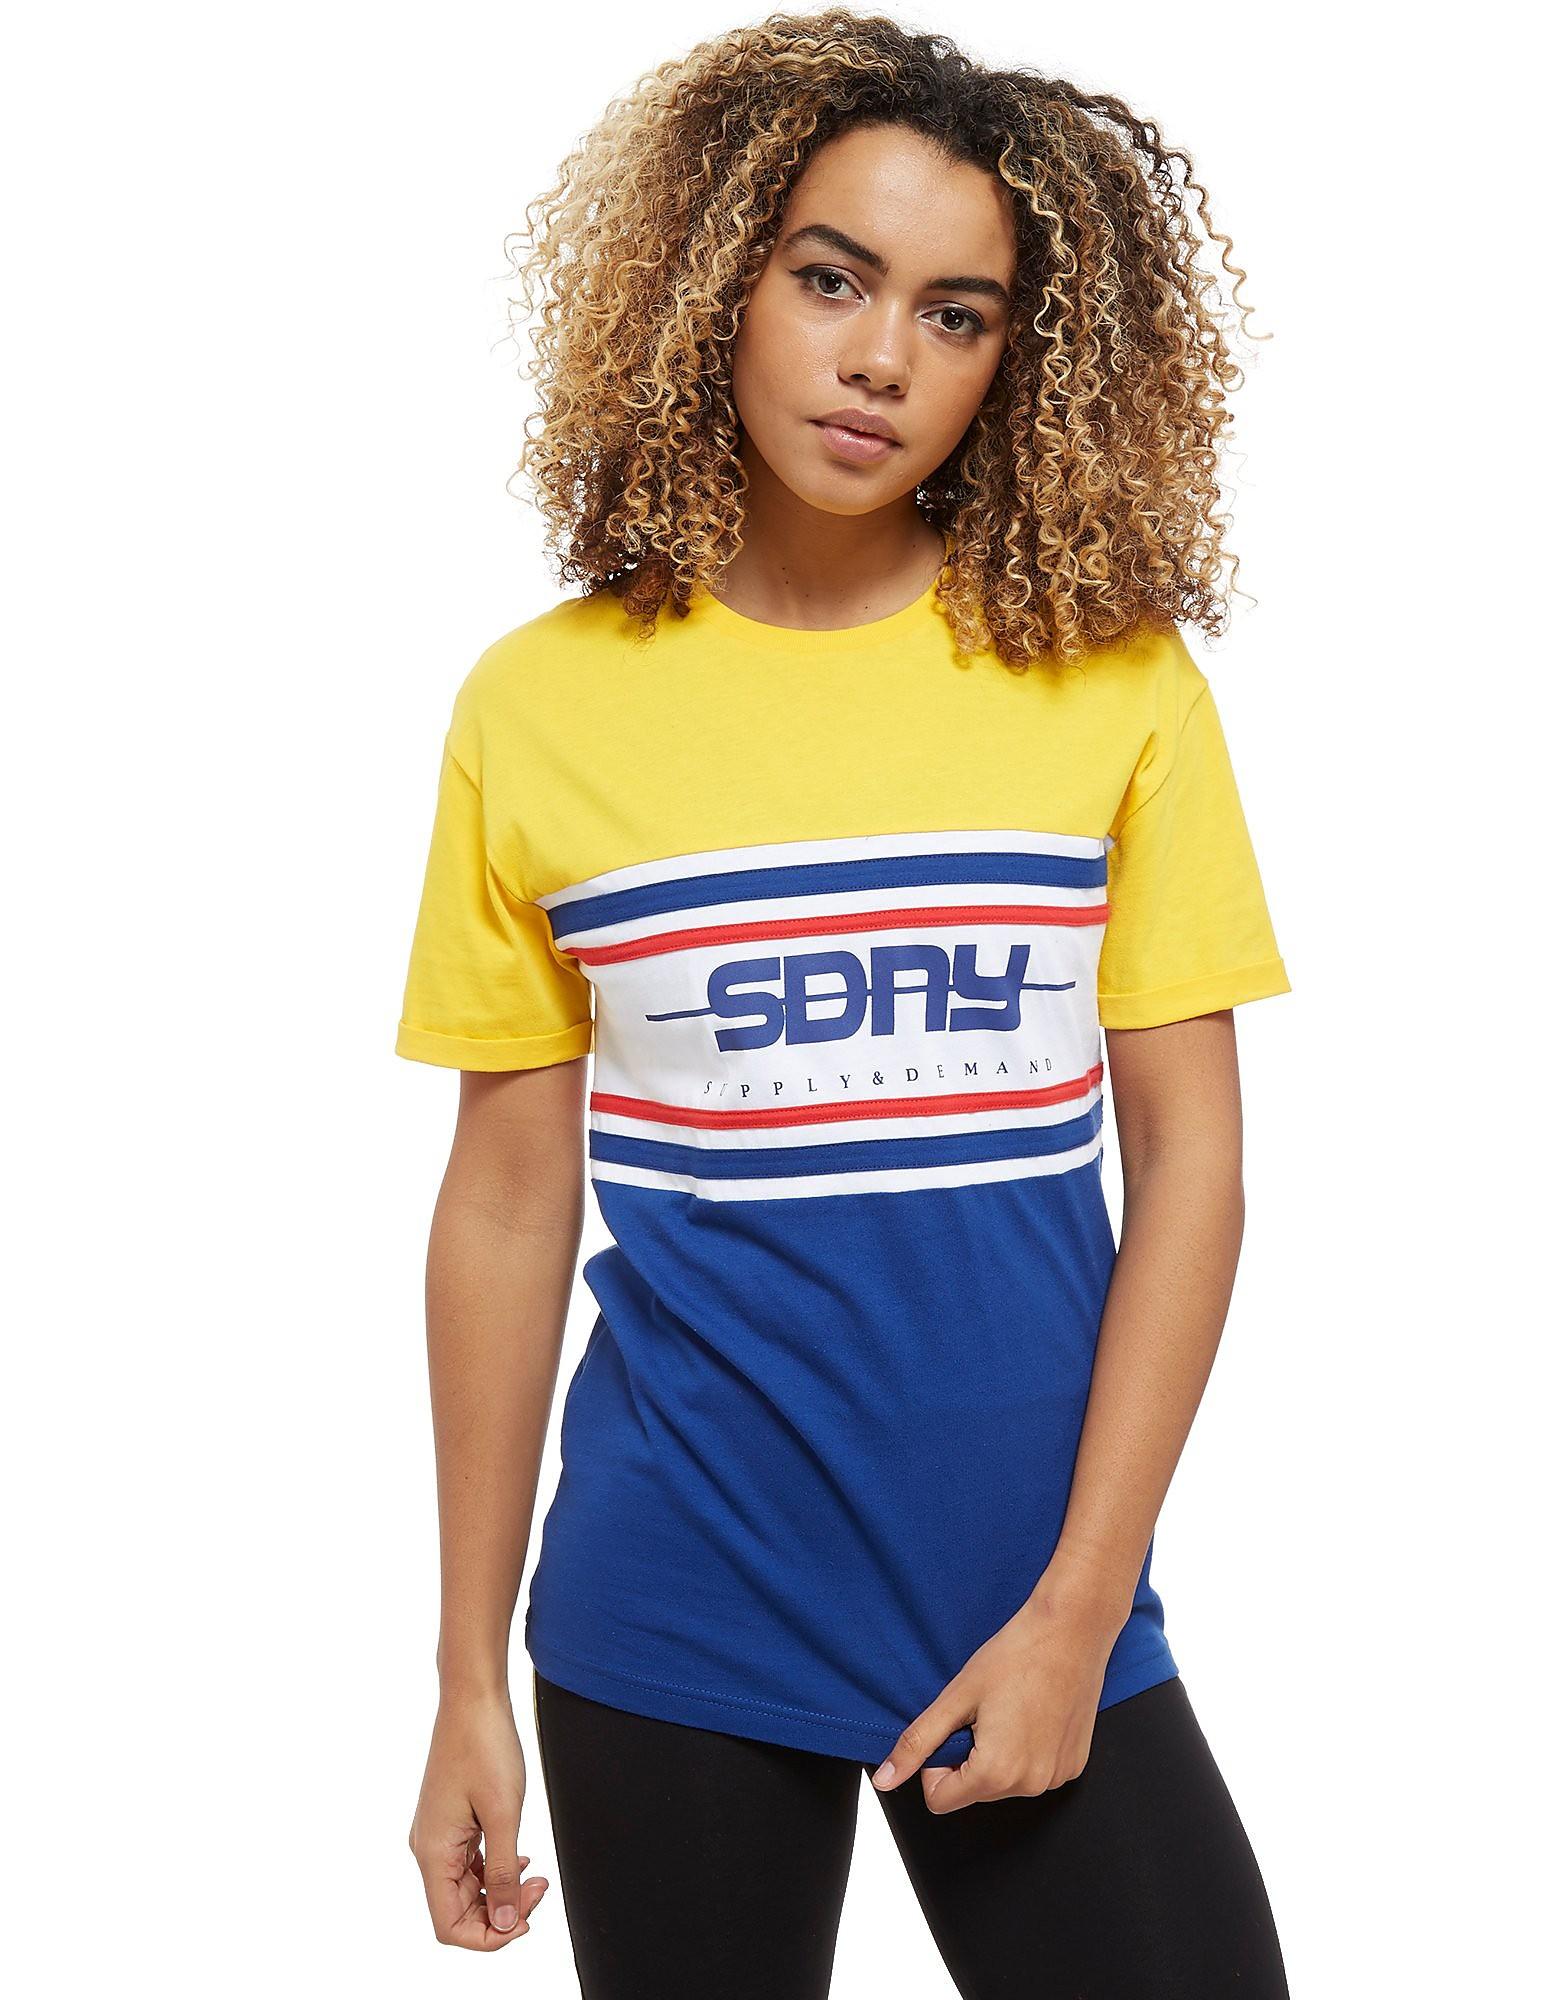 Supply & Demand 92 Retro T-Shirt